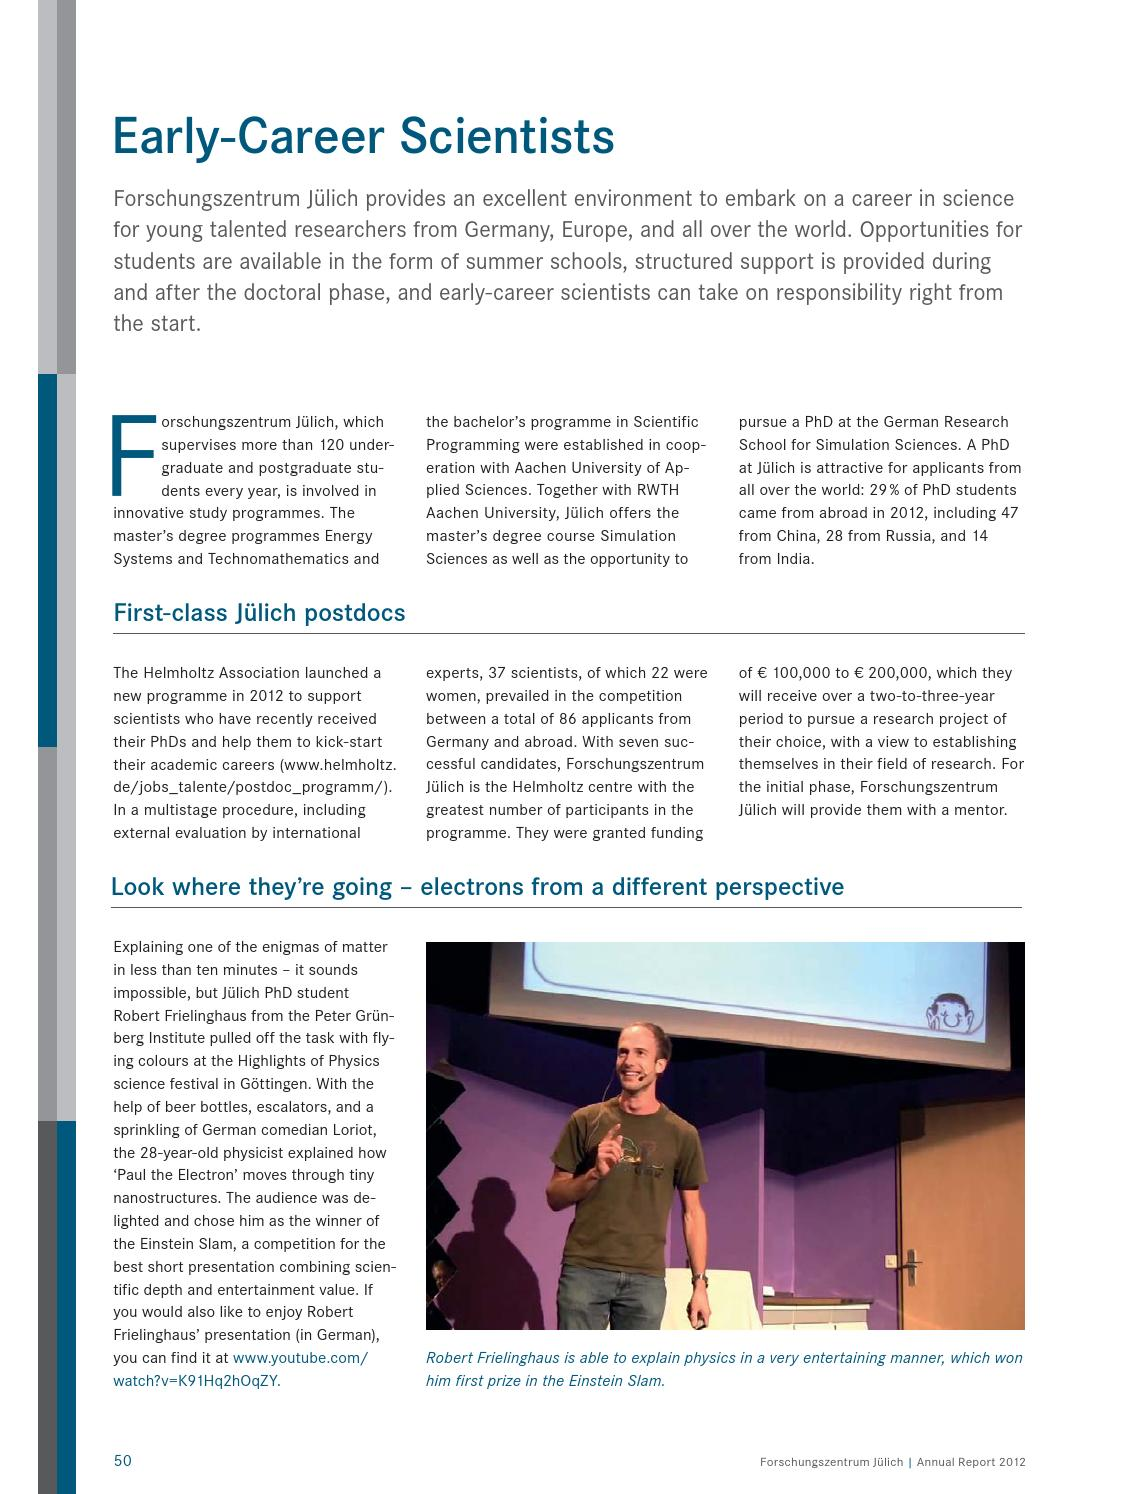 Annual Report 2012 by Forschungszentrum Jülich - issuu